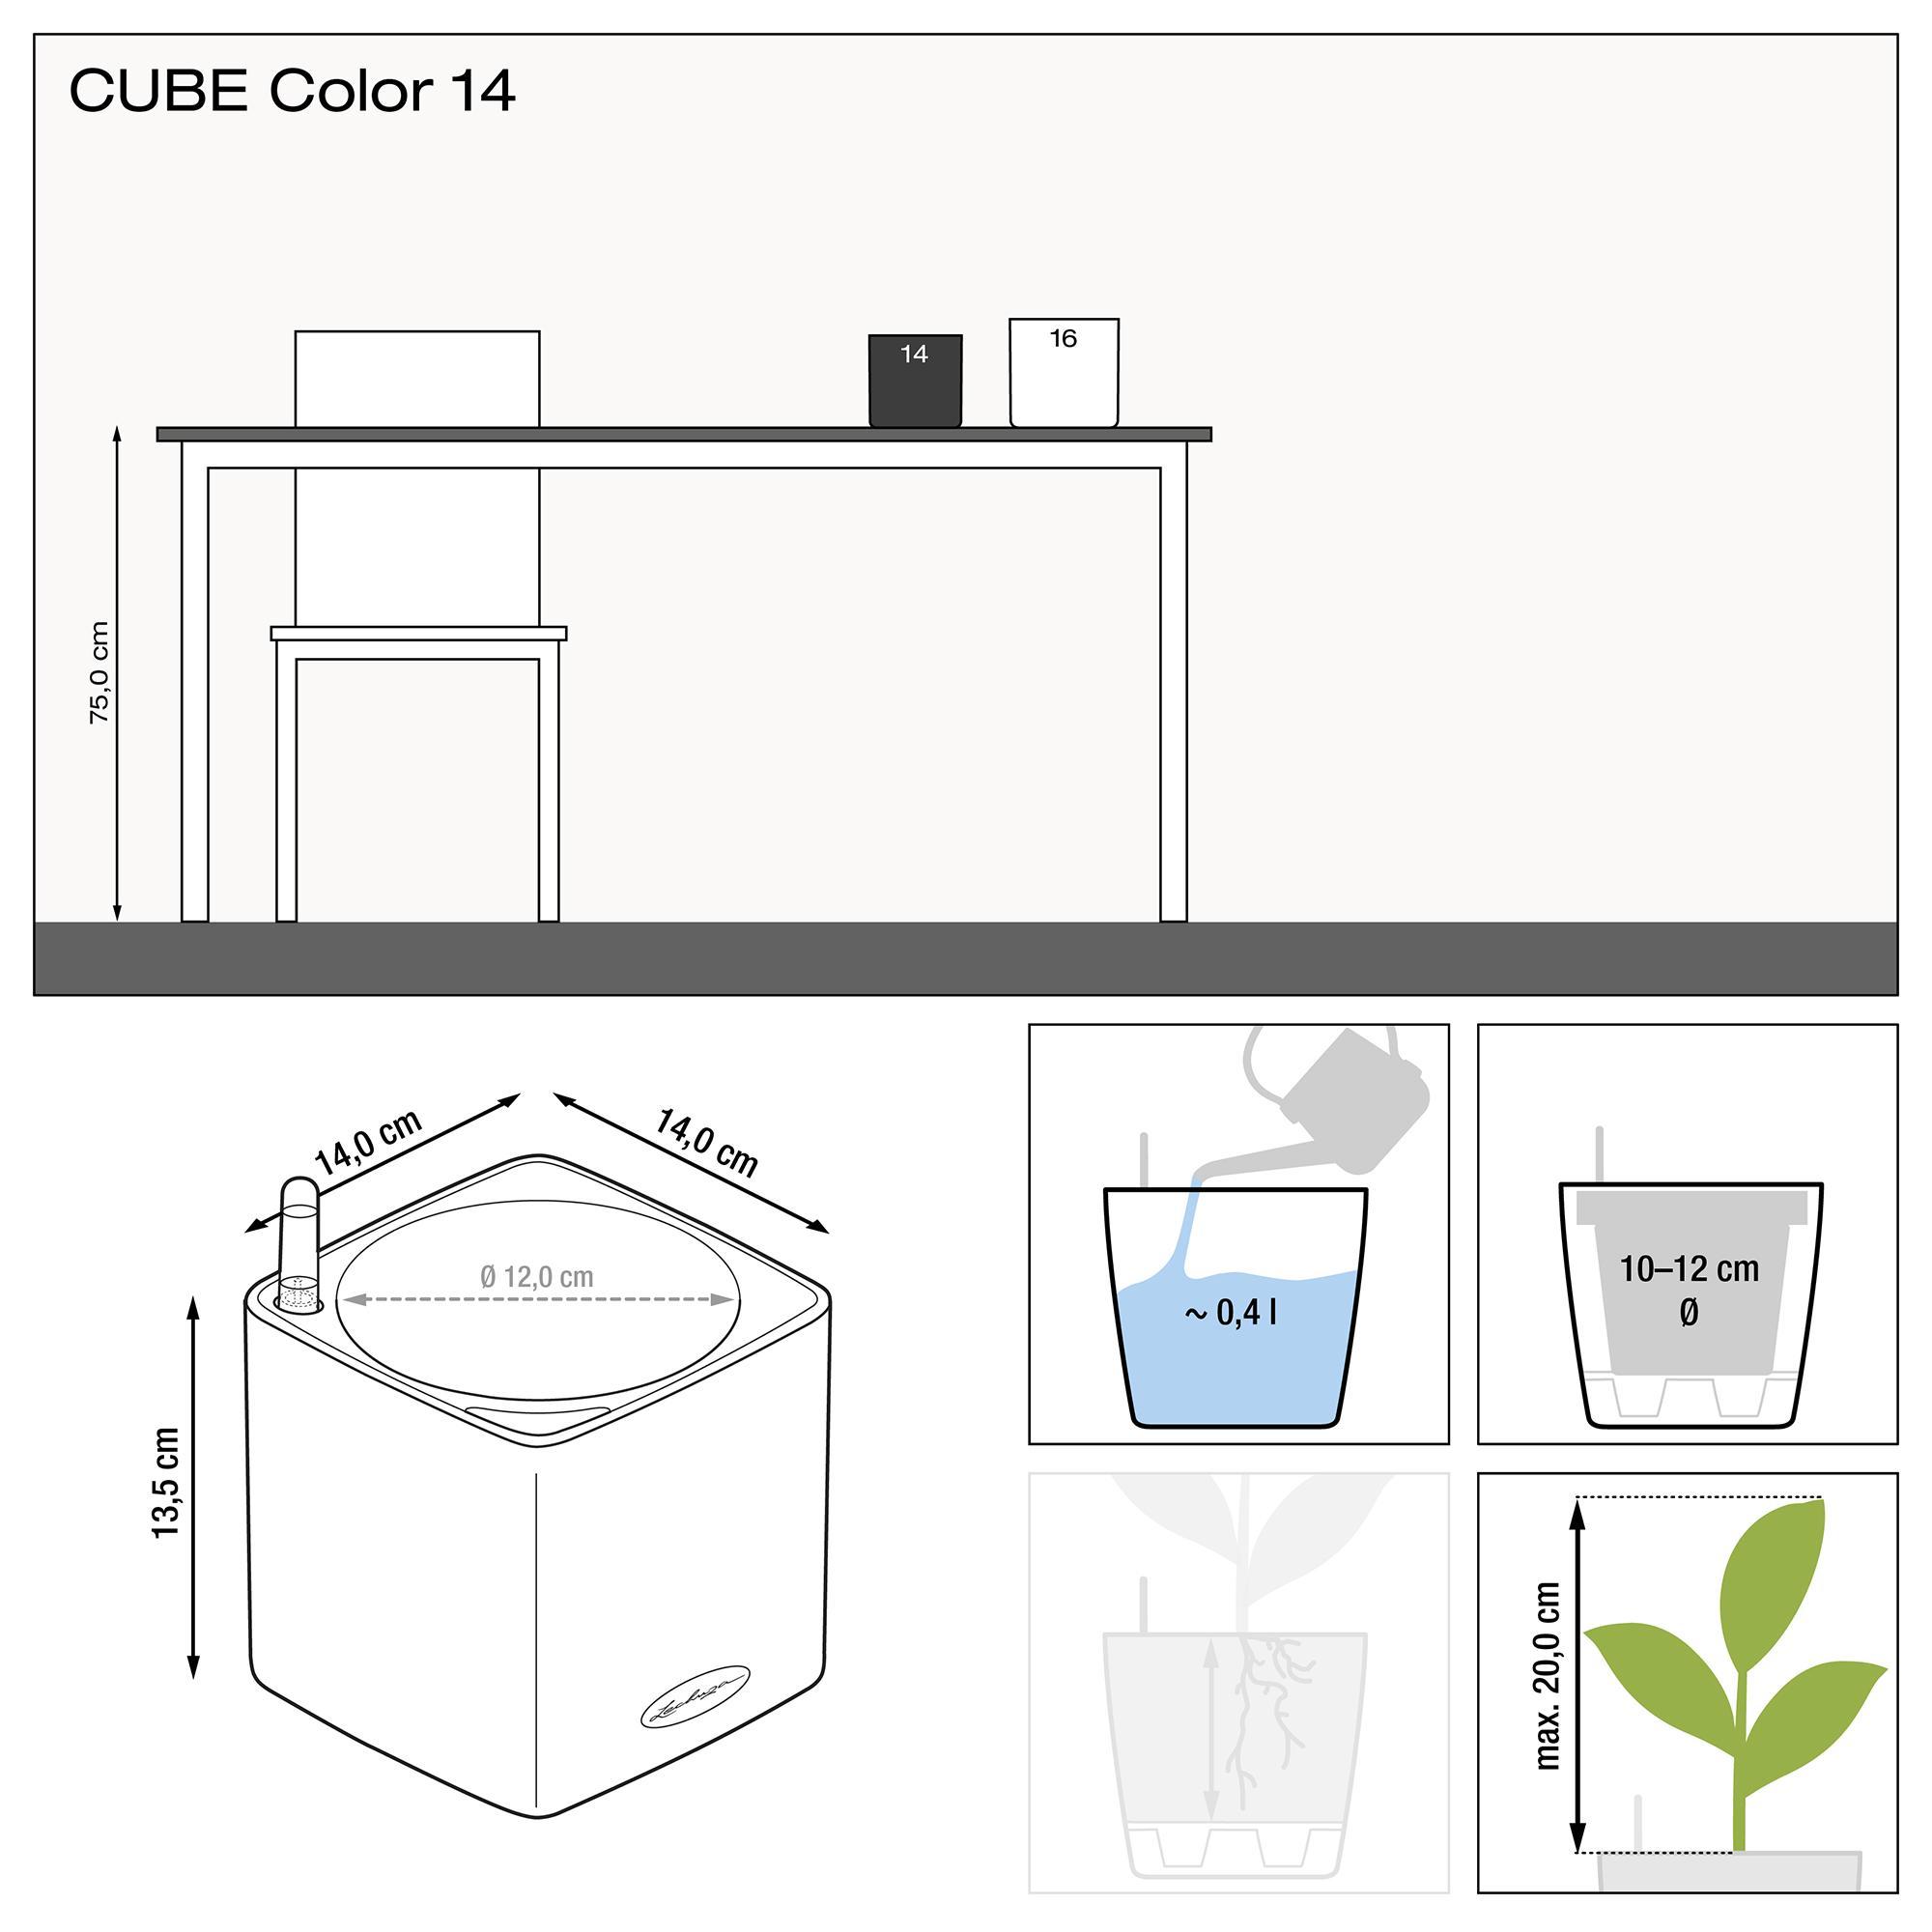 CUBE Color 14 slate - Image 2